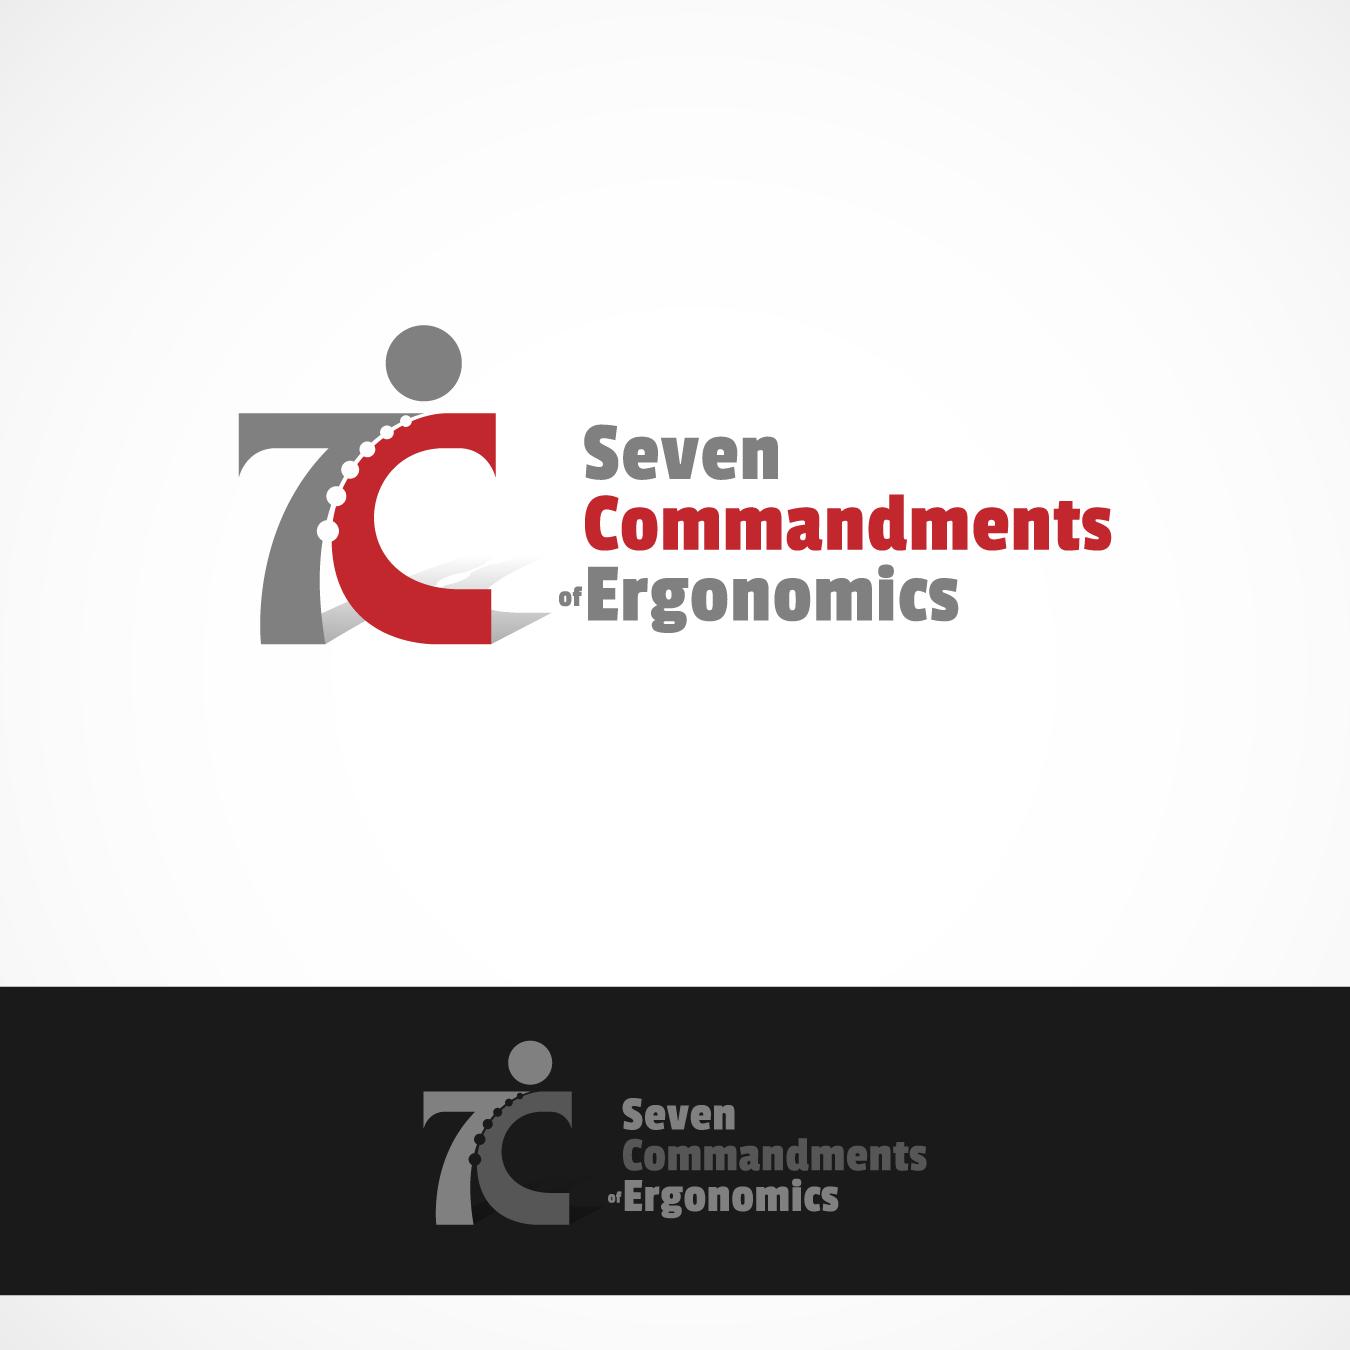 Logo Design by zesthar - Entry No. 137 in the Logo Design Contest Logo Design for Seven Commandments of Ergonomics.